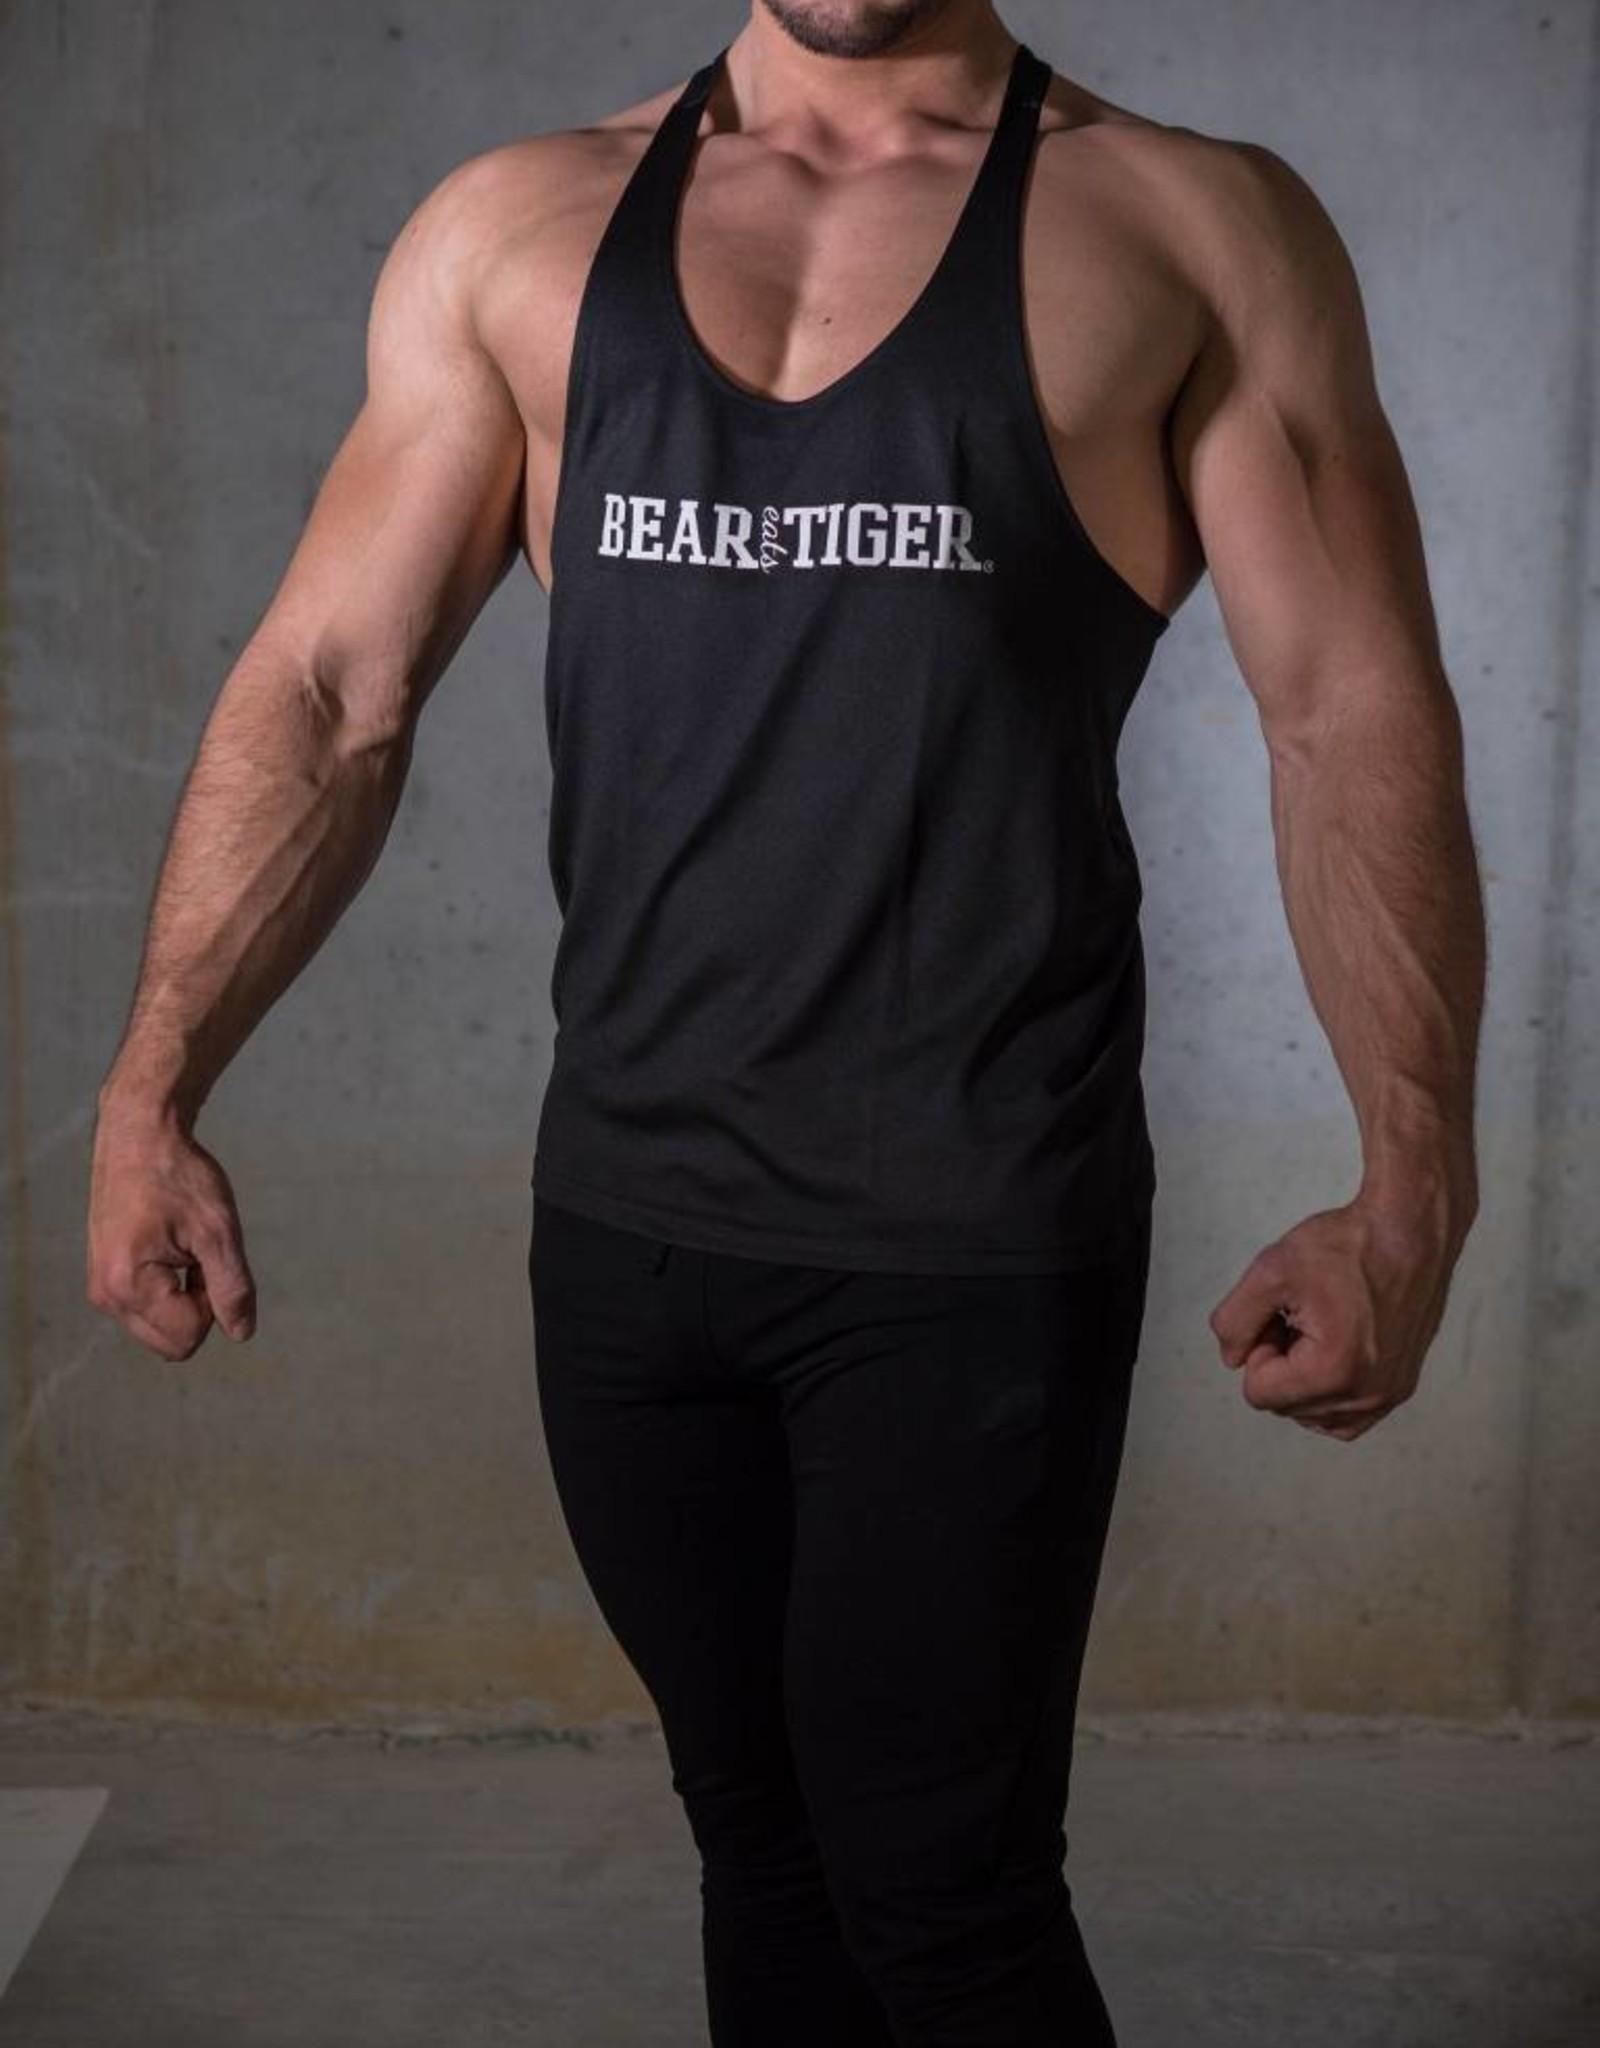 Bear eats tiger Bear eats tiger fitness and lifestyle clothing.